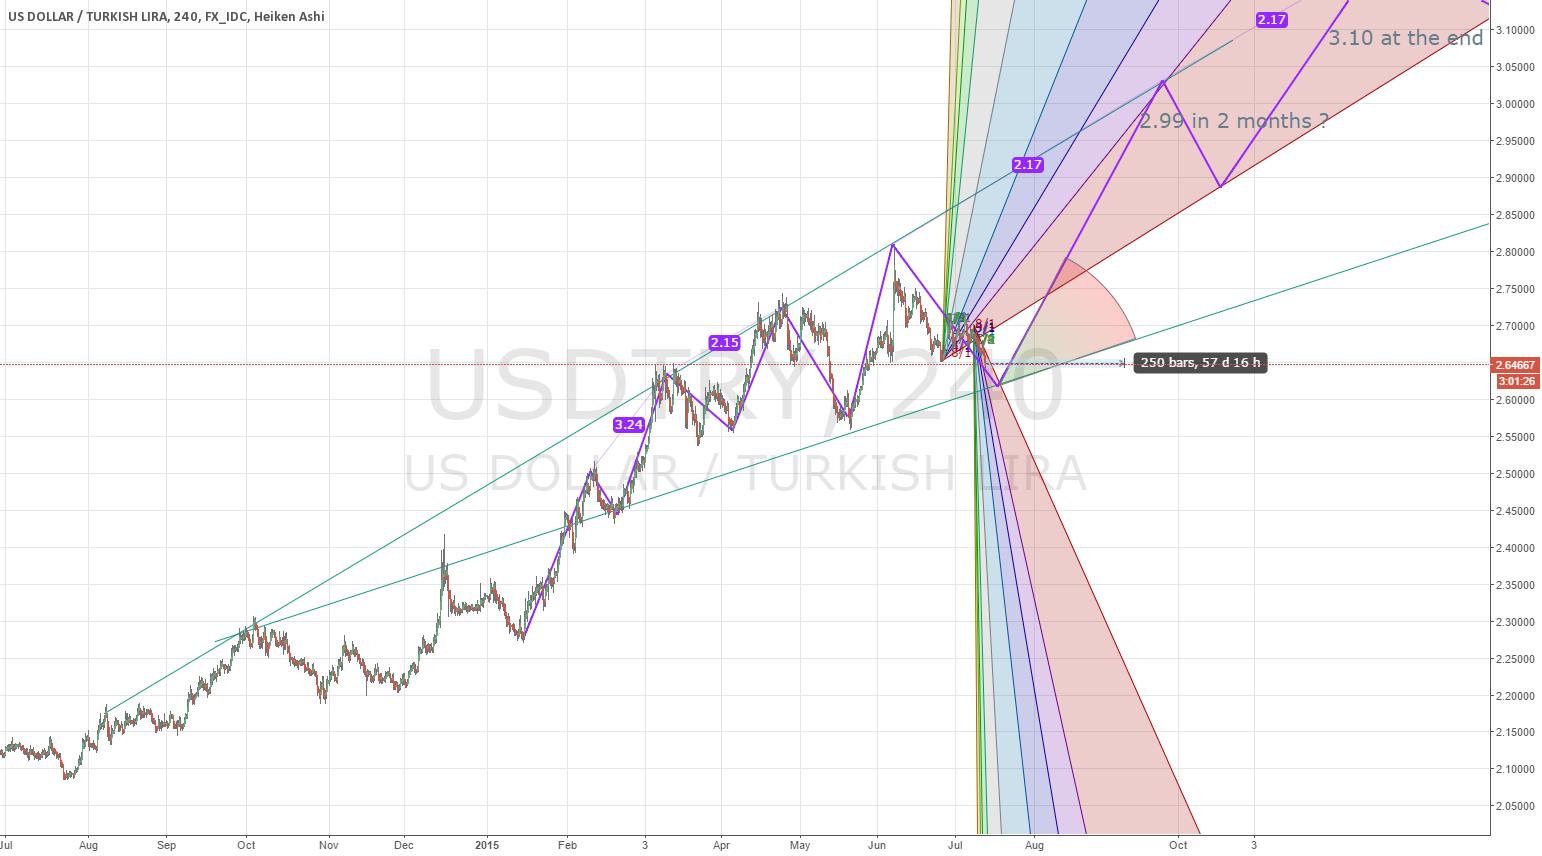 USDTRY End of 2015 3.04-3.11 range ?